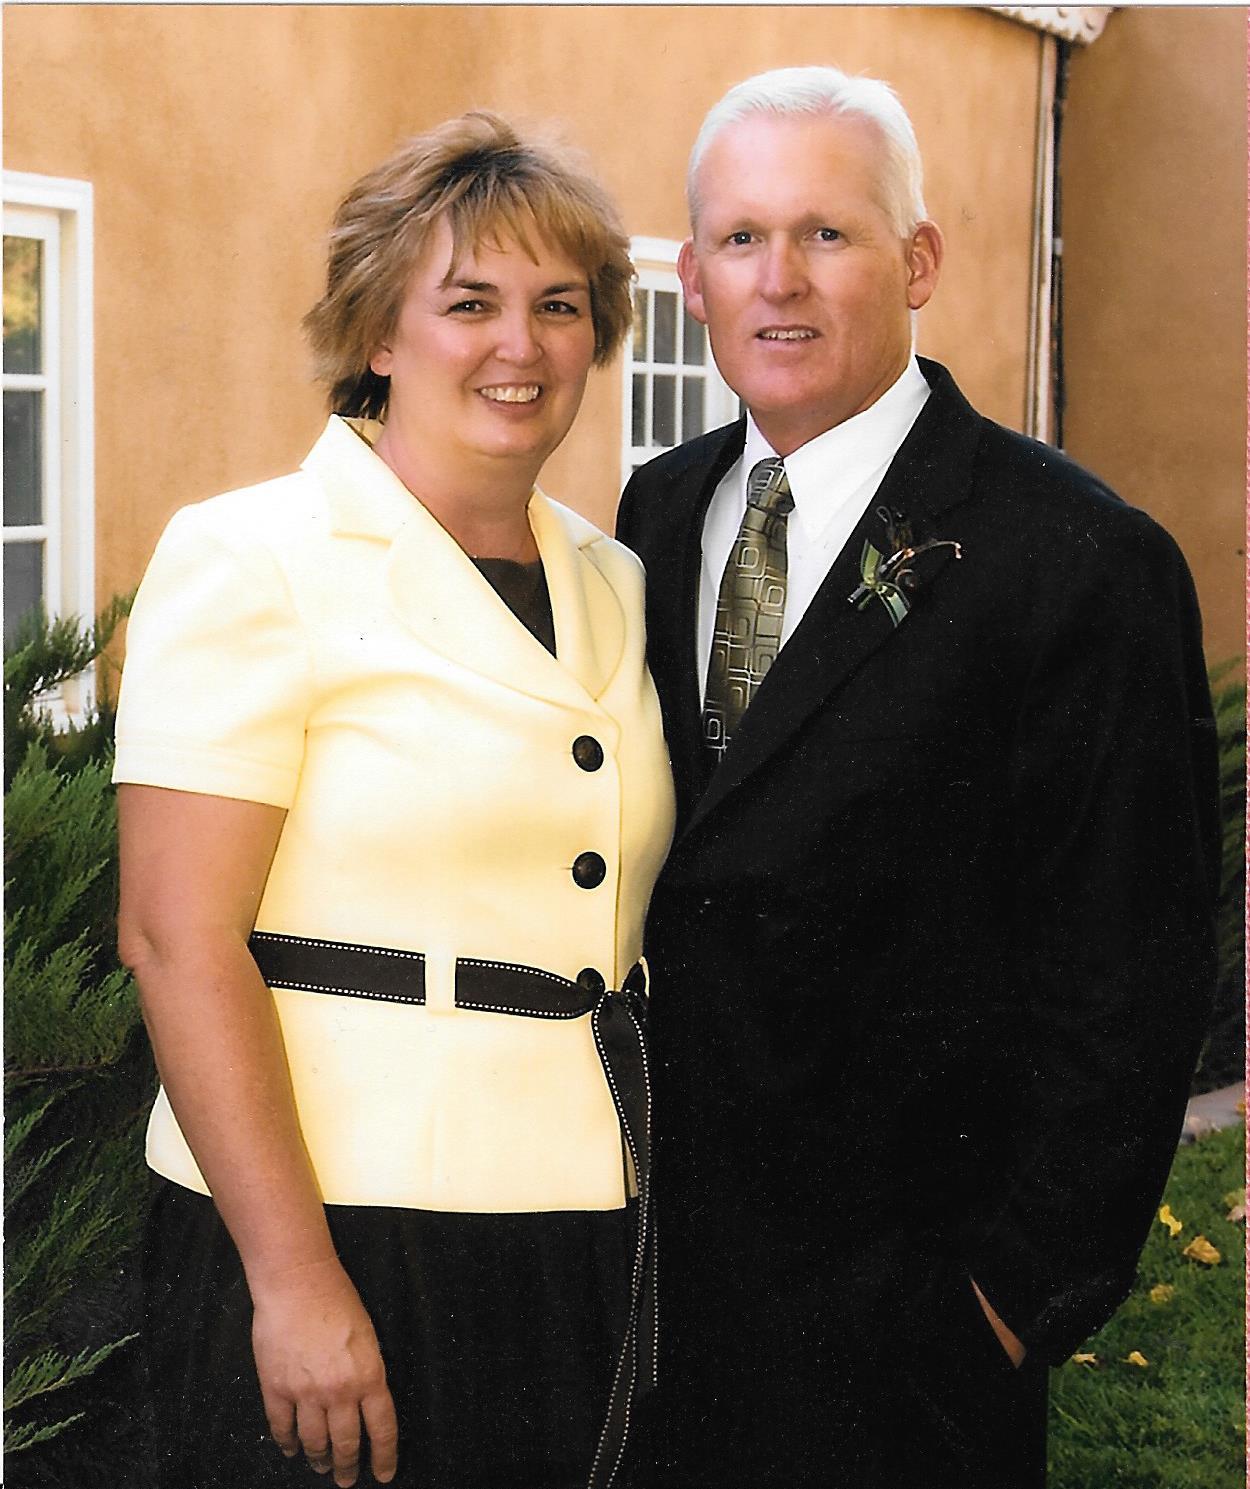 Julie with her husband, Jeffrey.